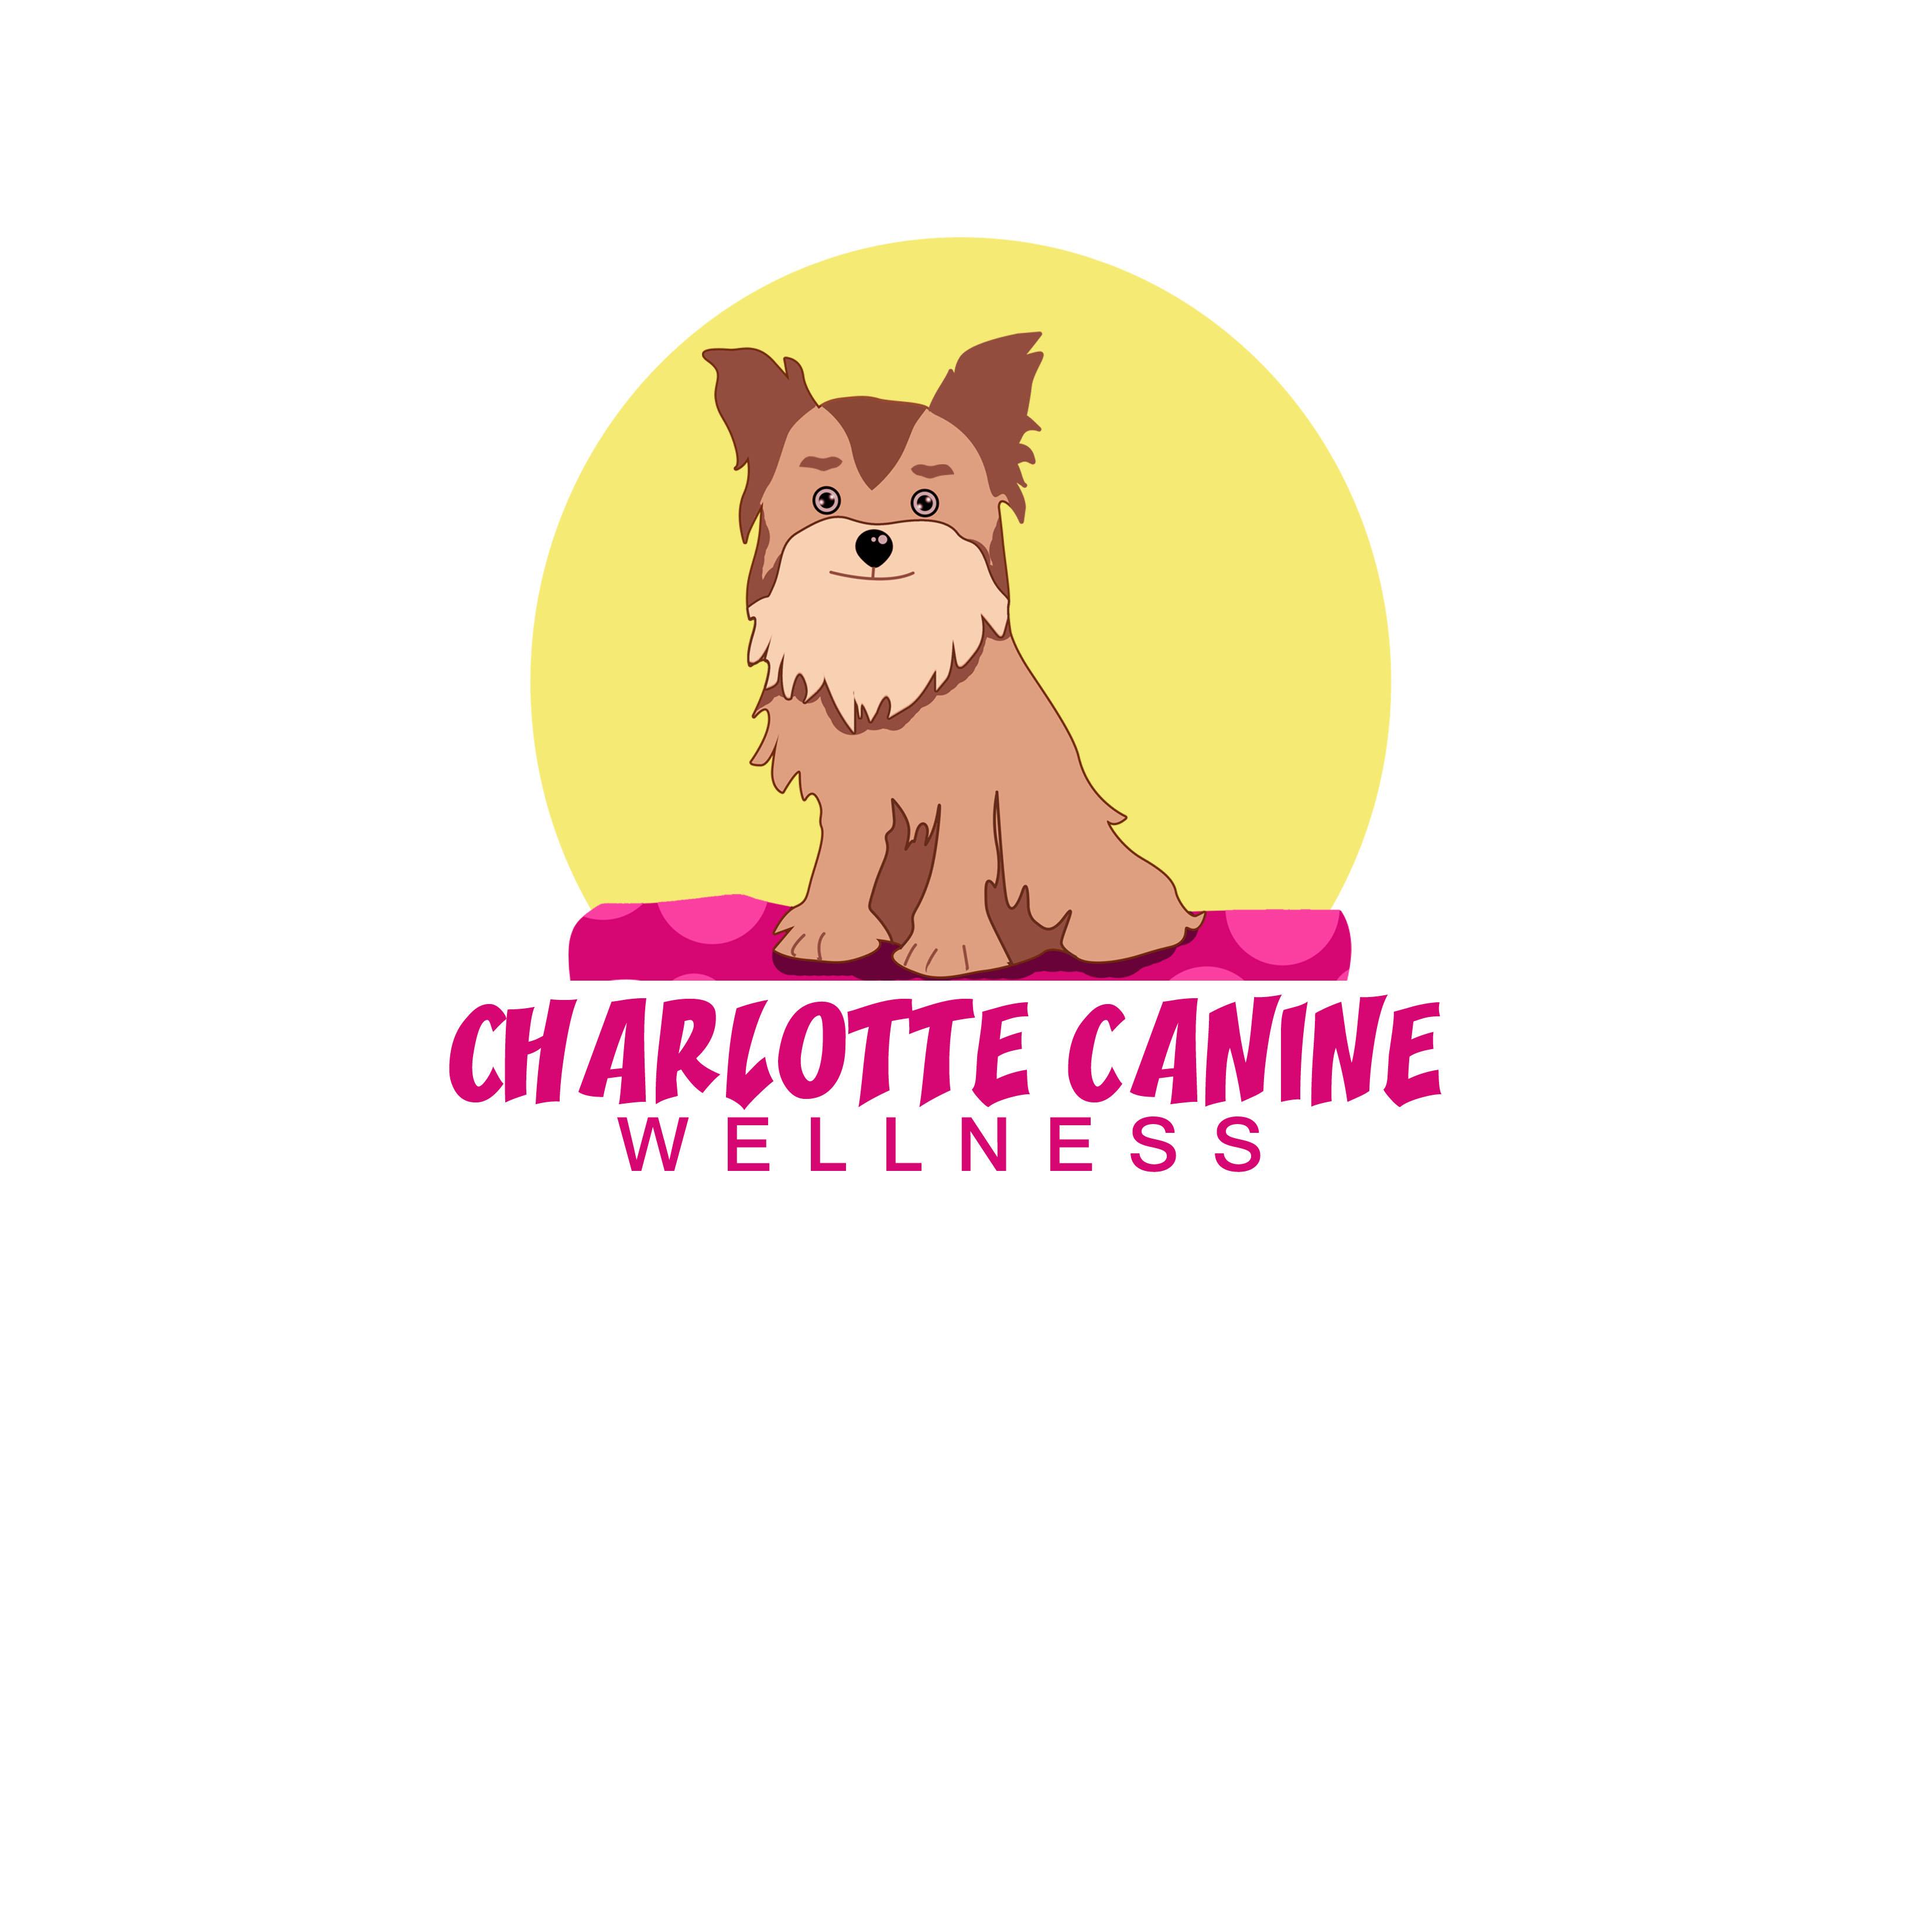 Logo Design by Allan Esclamado - Entry No. 17 in the Logo Design Contest New Logo Design for Charlotte Canine Wellness.